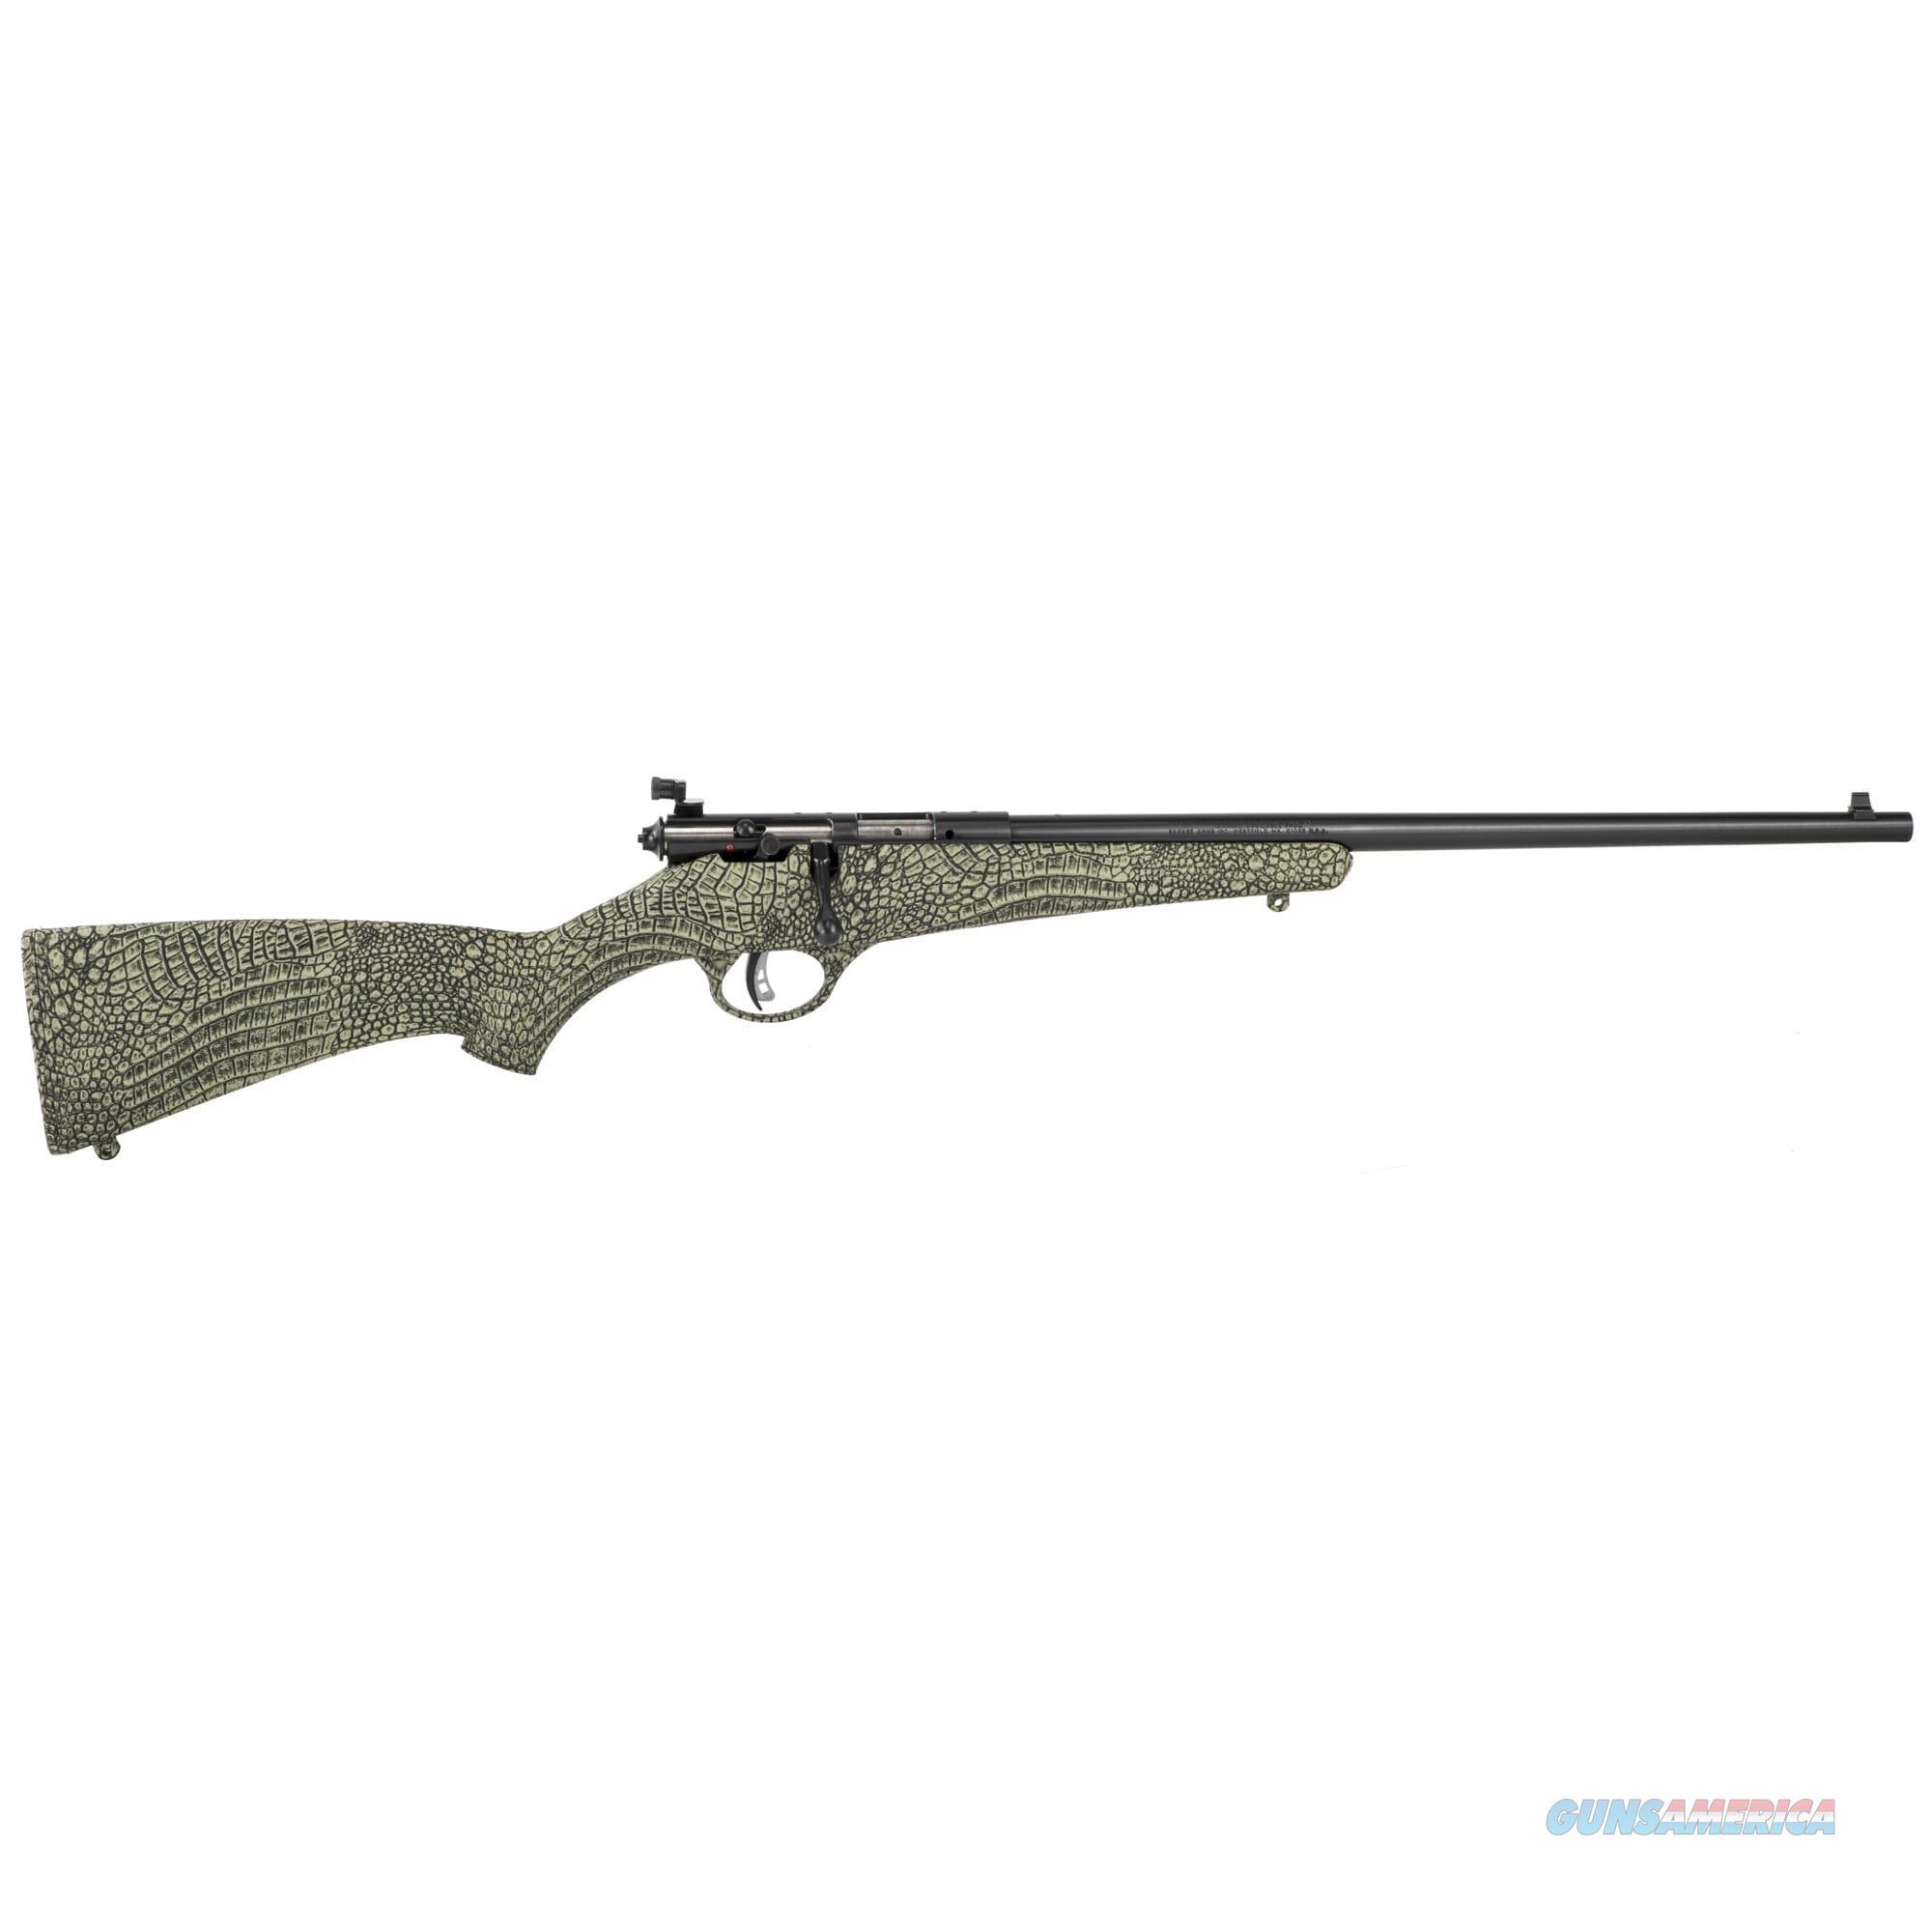 Savage Rascal, Troy Landry Gator Series, .22LR  Guns > Rifles > Savage Rifles > Rimfire